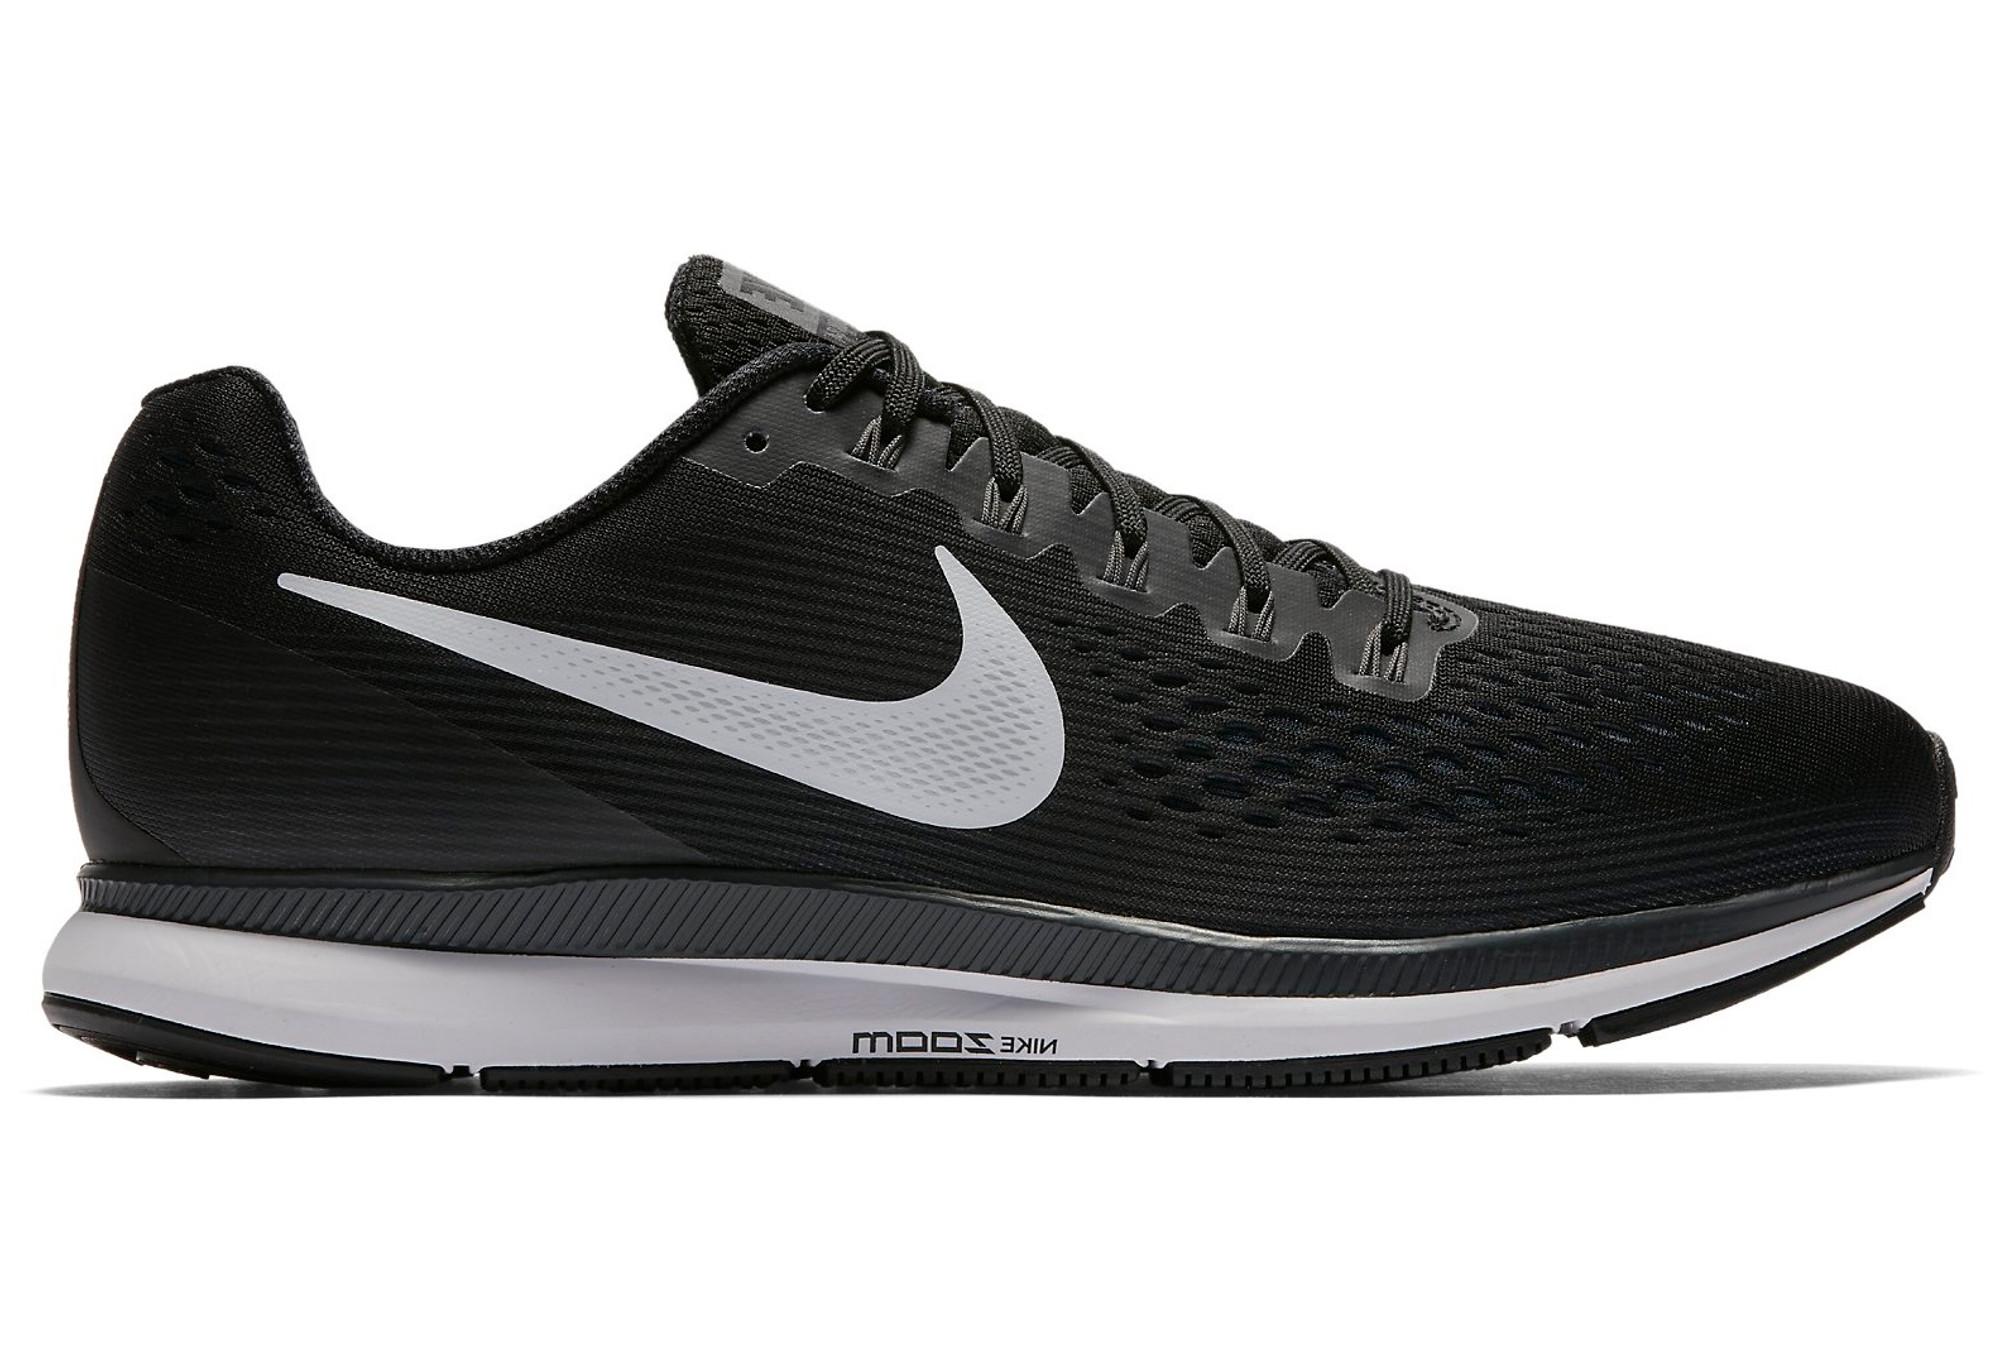 the best attitude 6f071 a7522 Chaussures de Running Nike Air Zoom Pegasus 34 Noir   Blanc